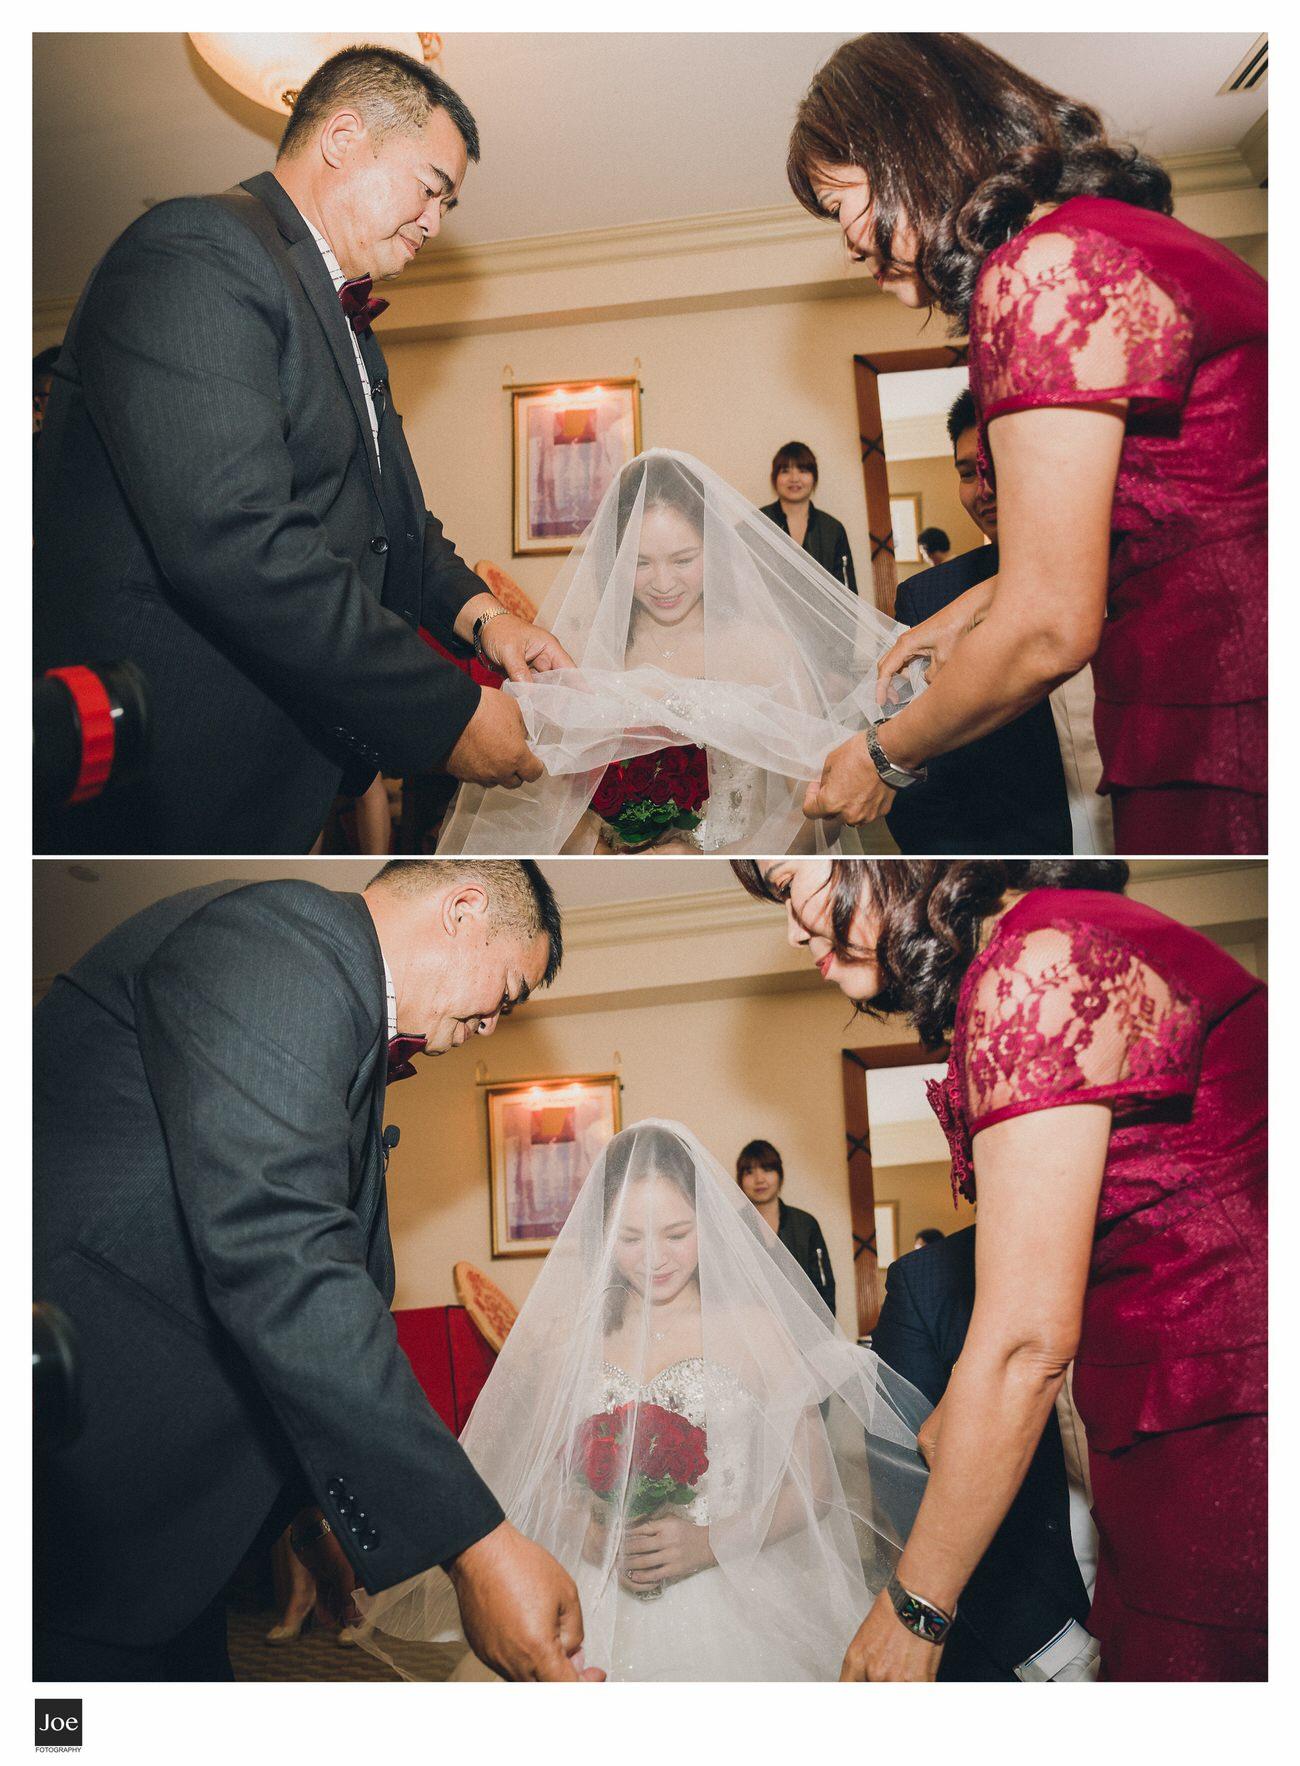 grand-hilai-hotel-wedding-daniel-yvette-joe-fotography-064.jpg